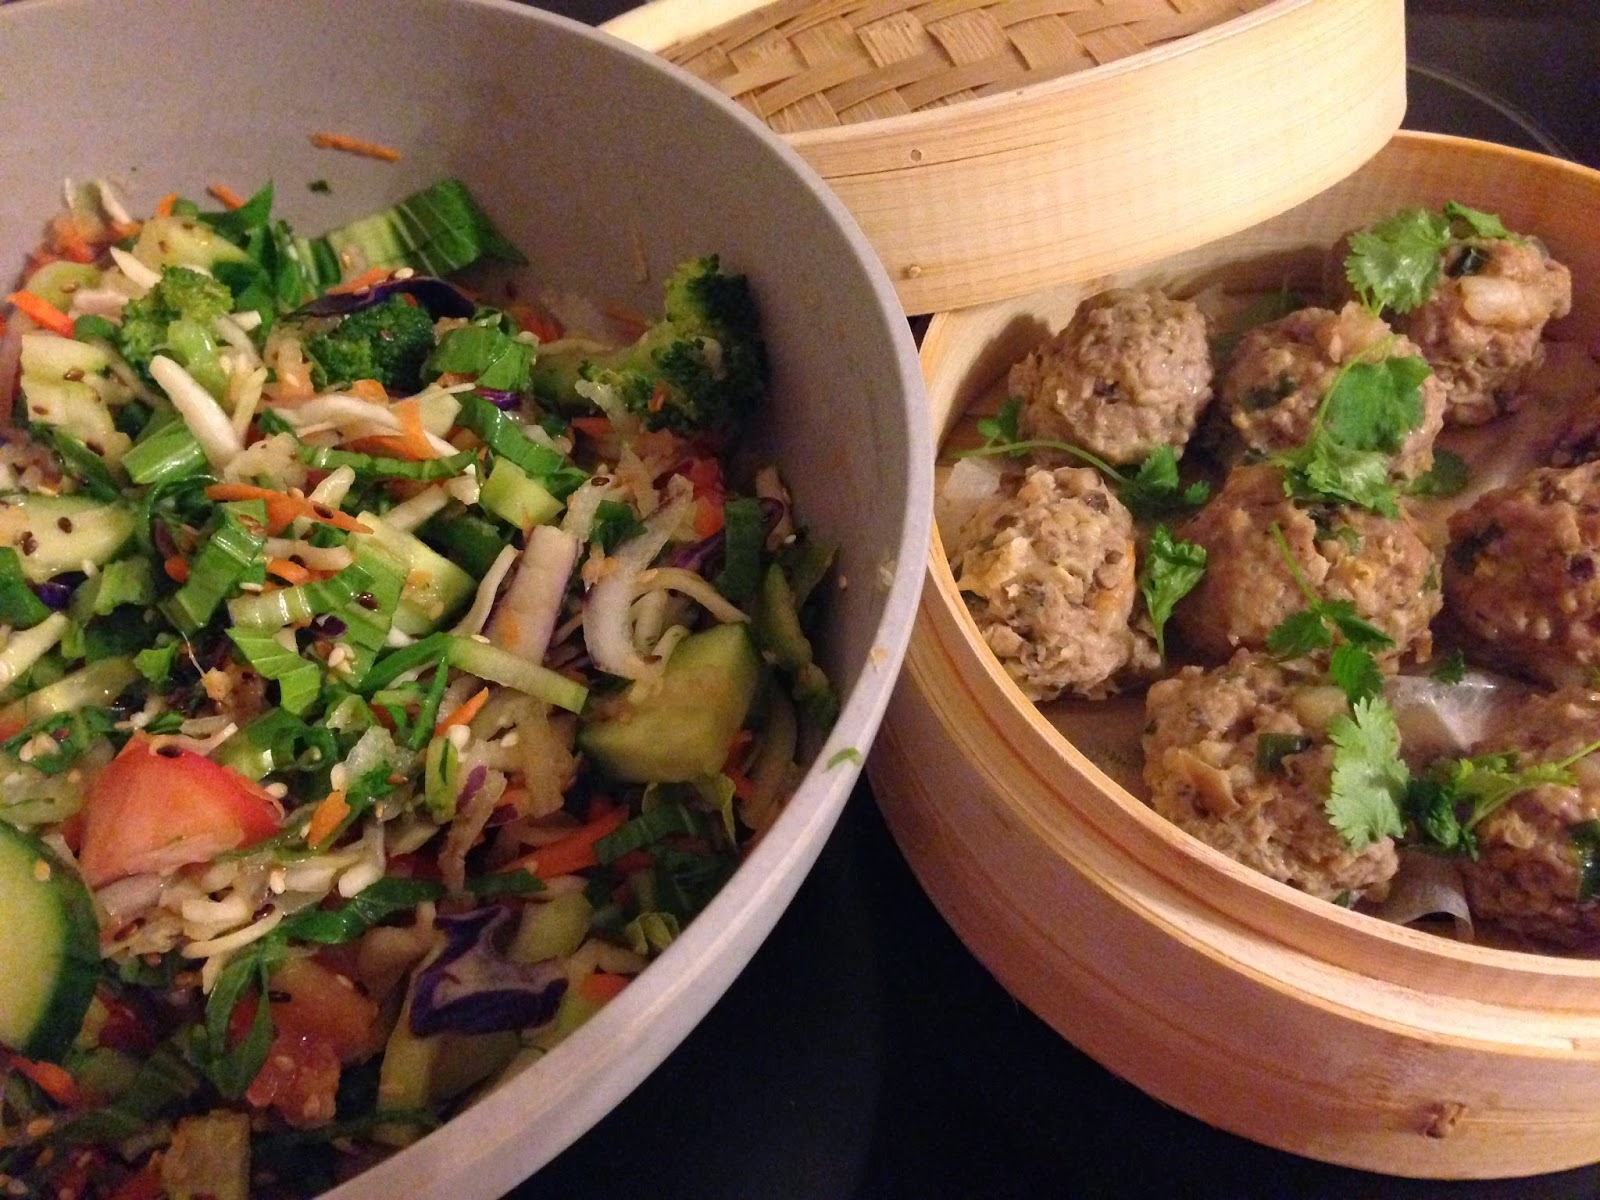 Pork and Prawn Siu Mai Meatballs with Asian Slaw